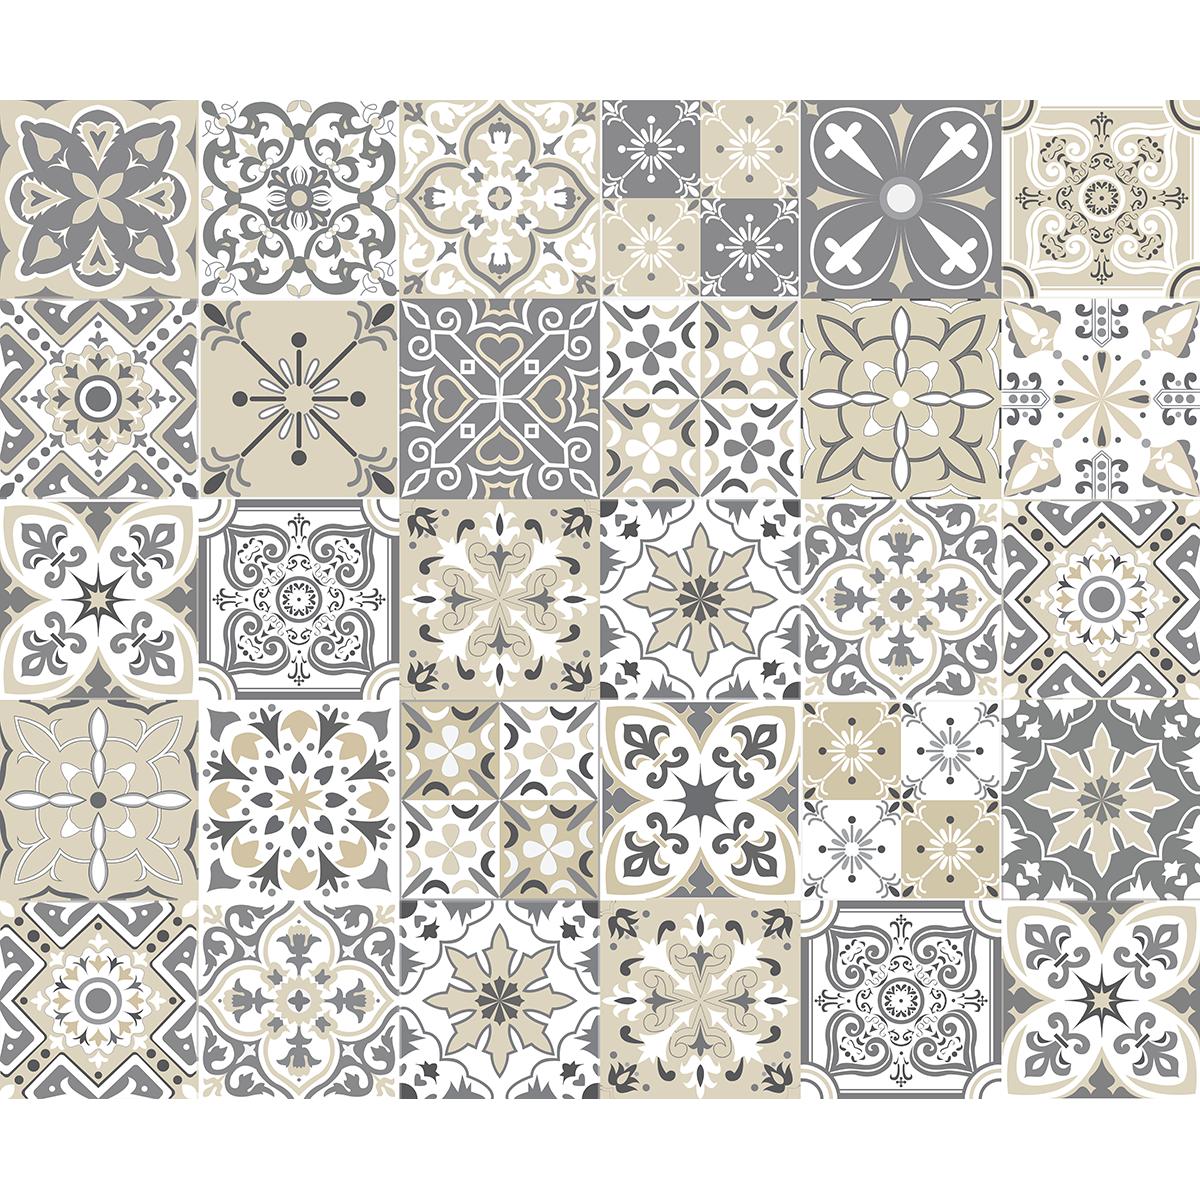 30 wandtatoos Zementfliesen azulejos turchi – WANDTATTOO